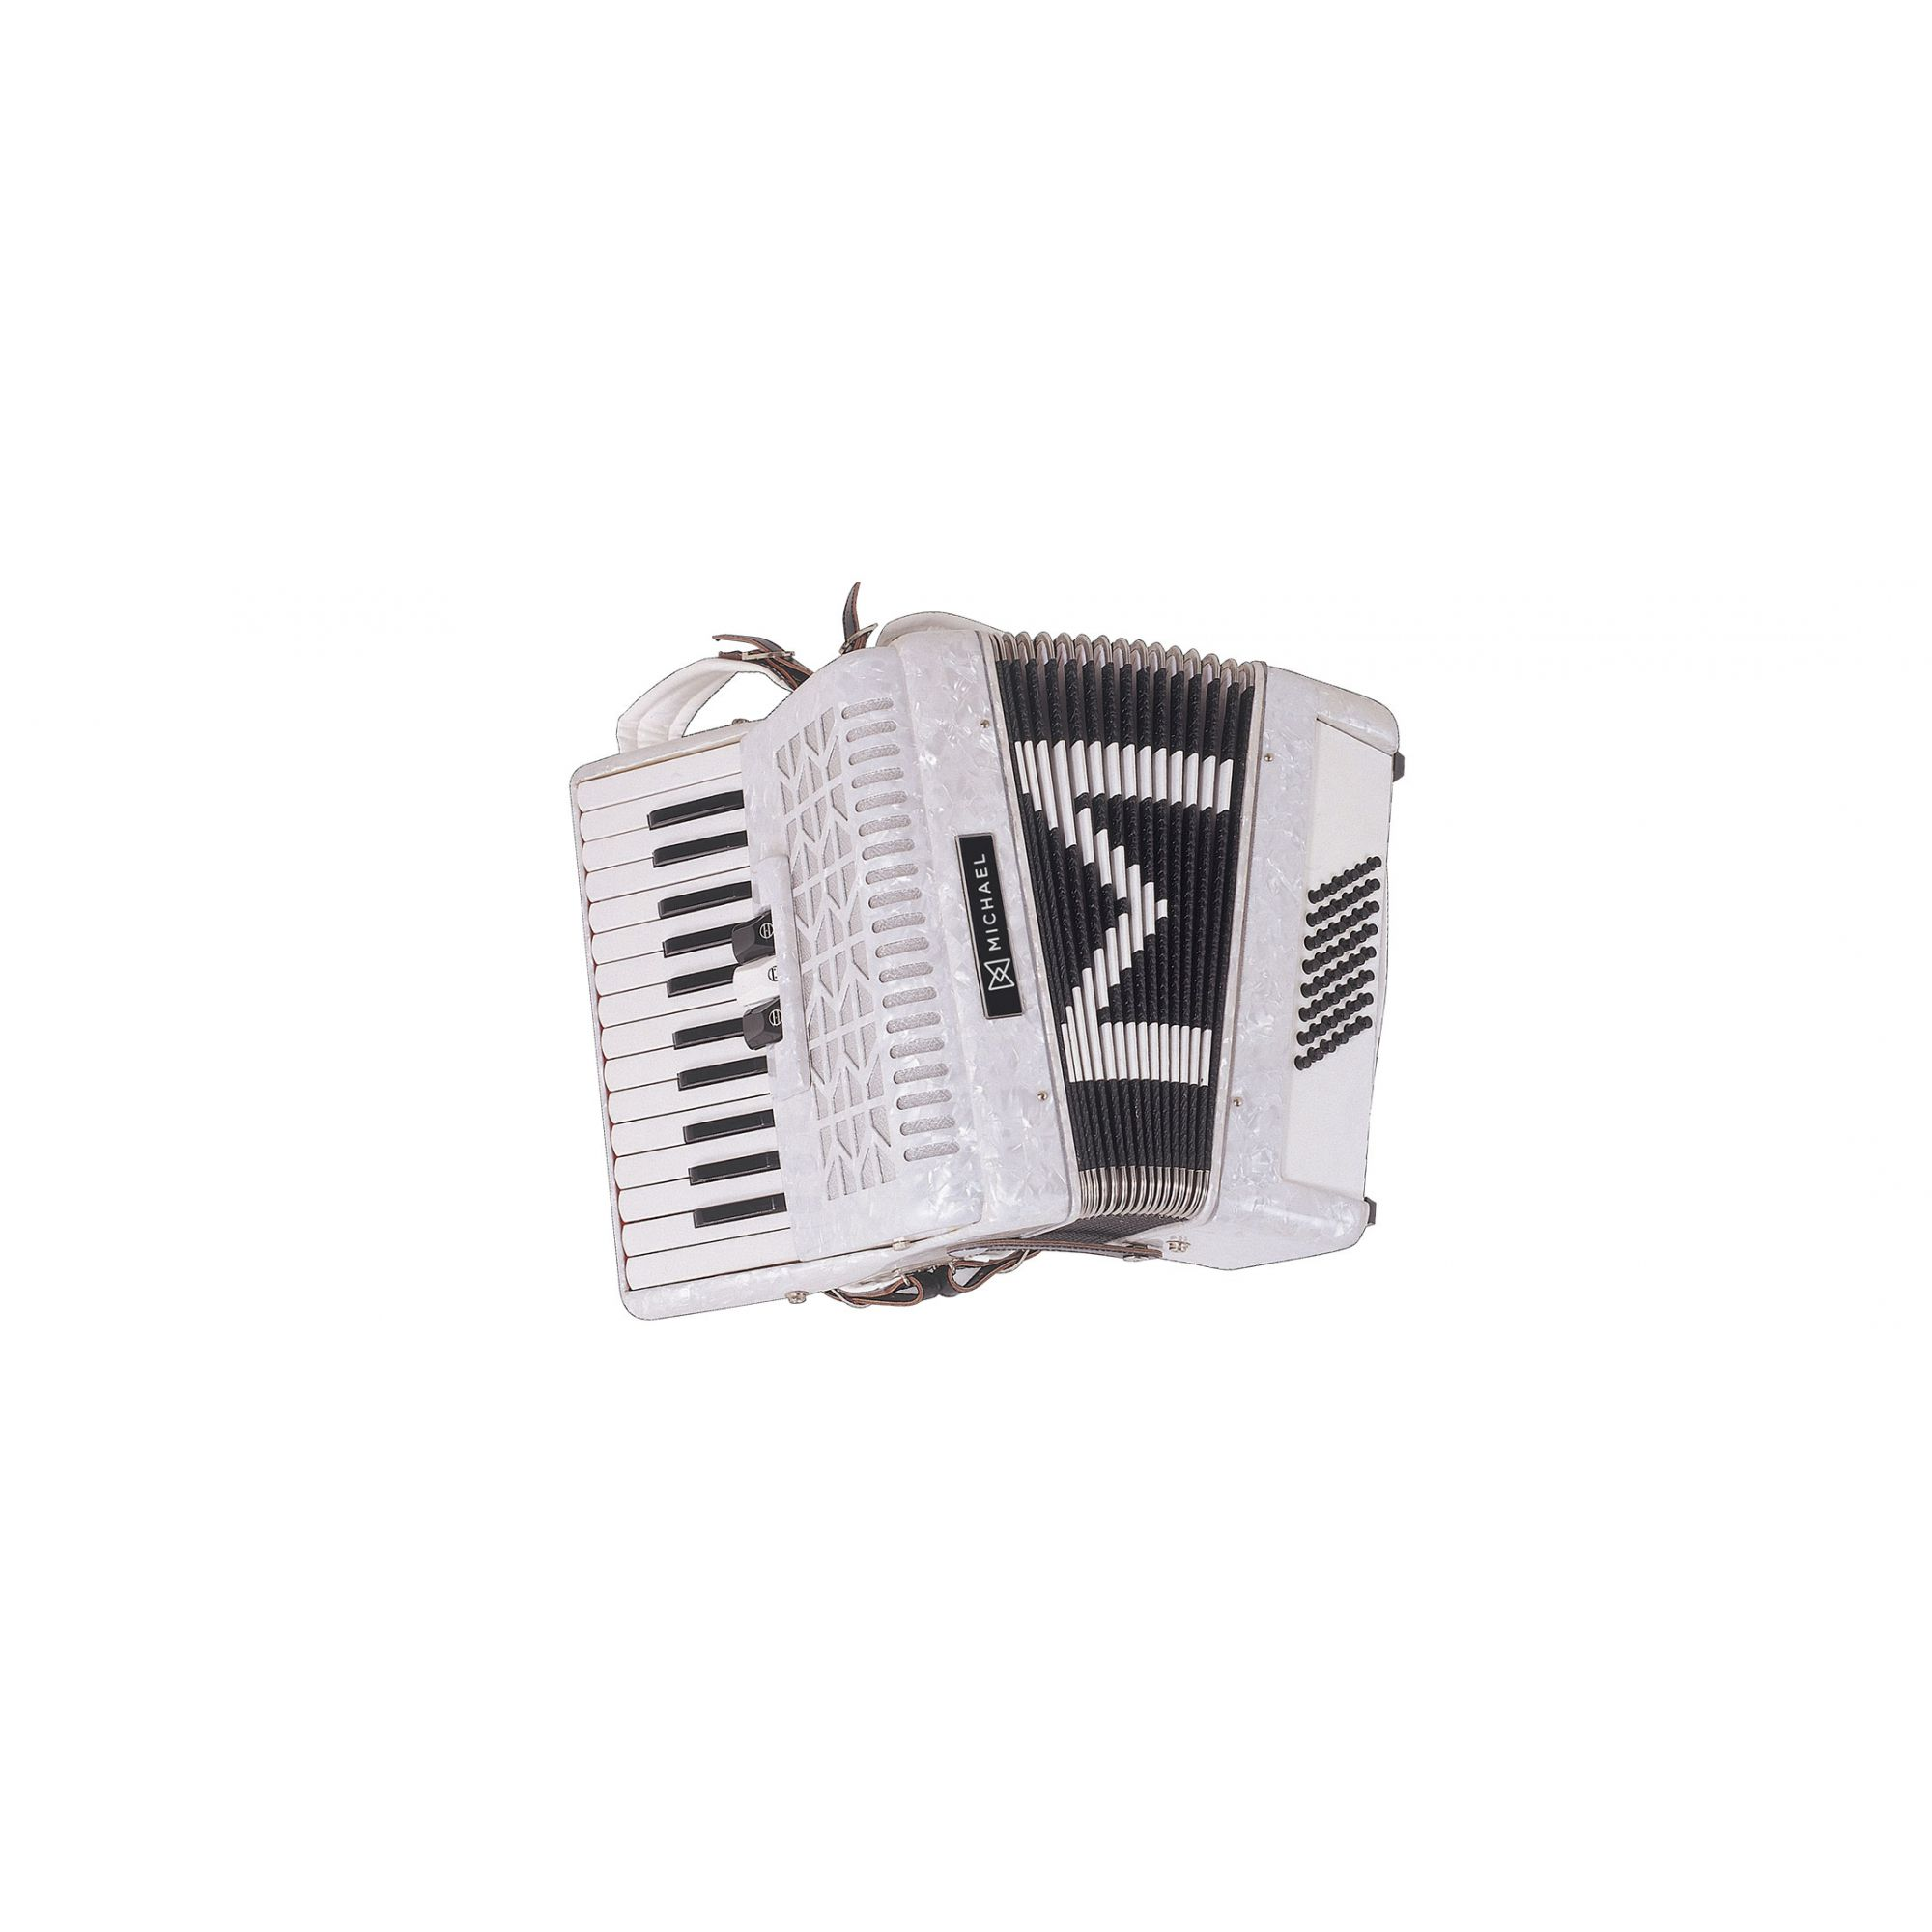 Acordeon Michael 48 Baixos Acm4803 Branco  - Luggi Instrumentos Musicais